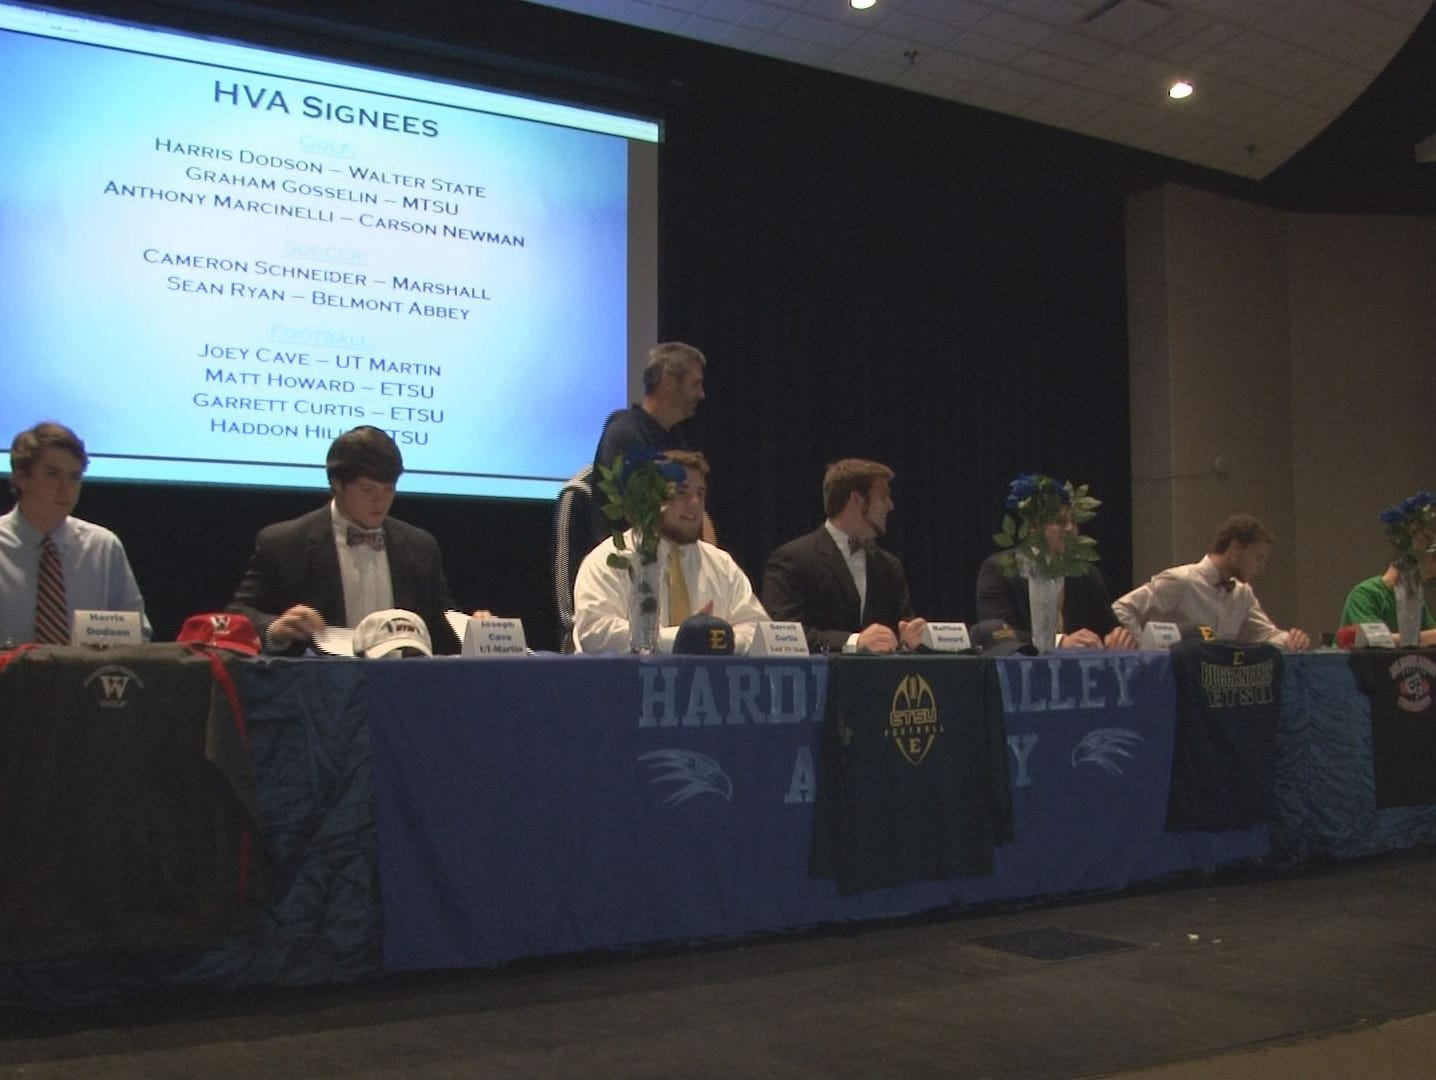 Hardin Valley's 2015 National Signing Day celebration